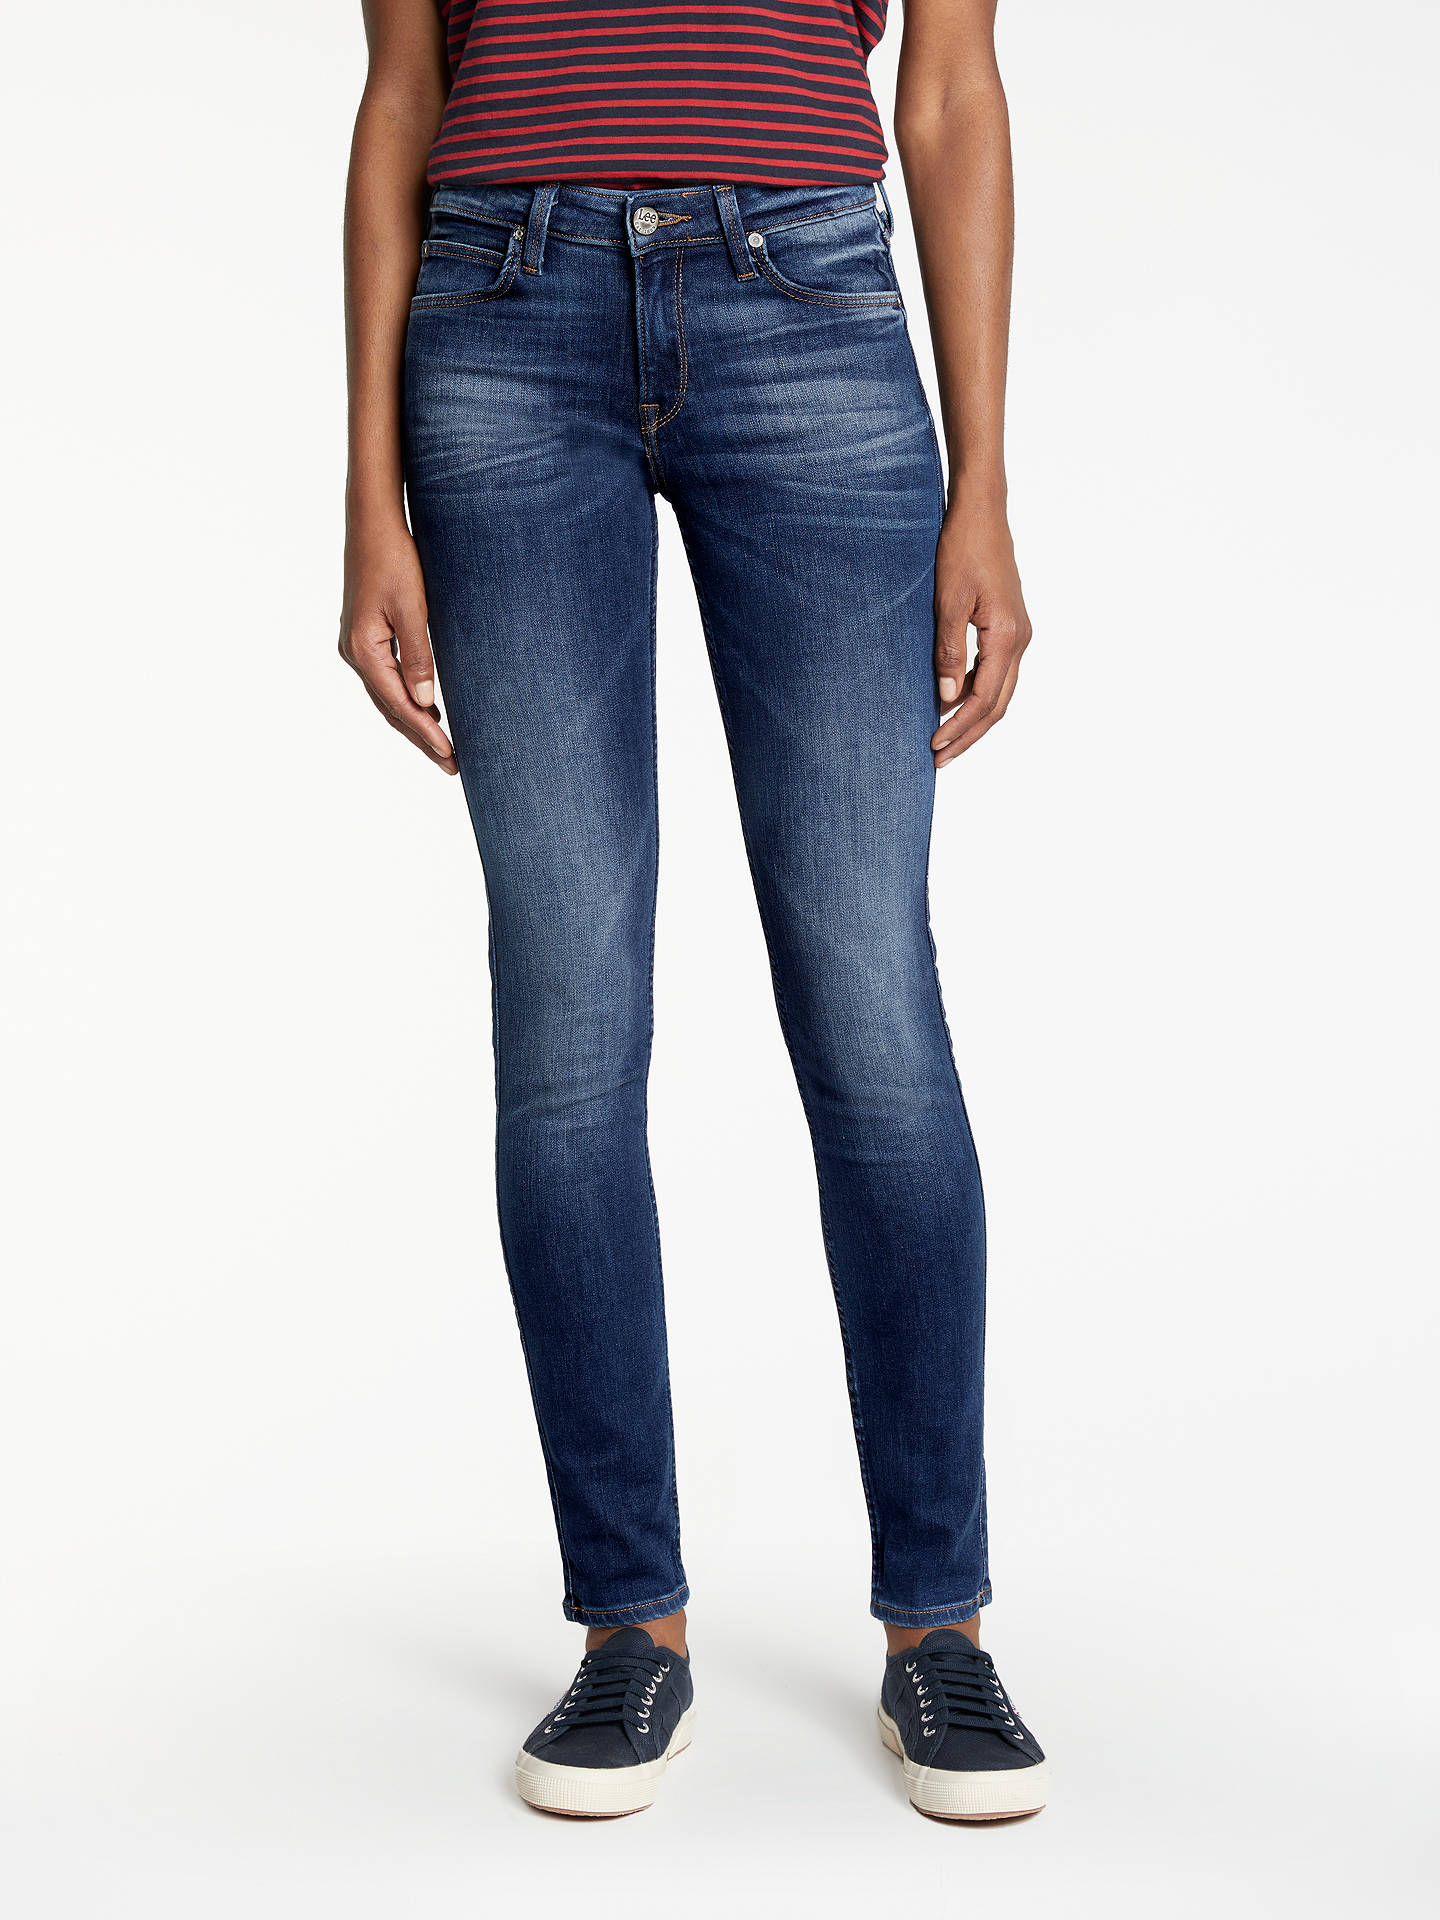 58b0b8be05c Buy Lee Scarlett Regular Waist Skinny Jeans